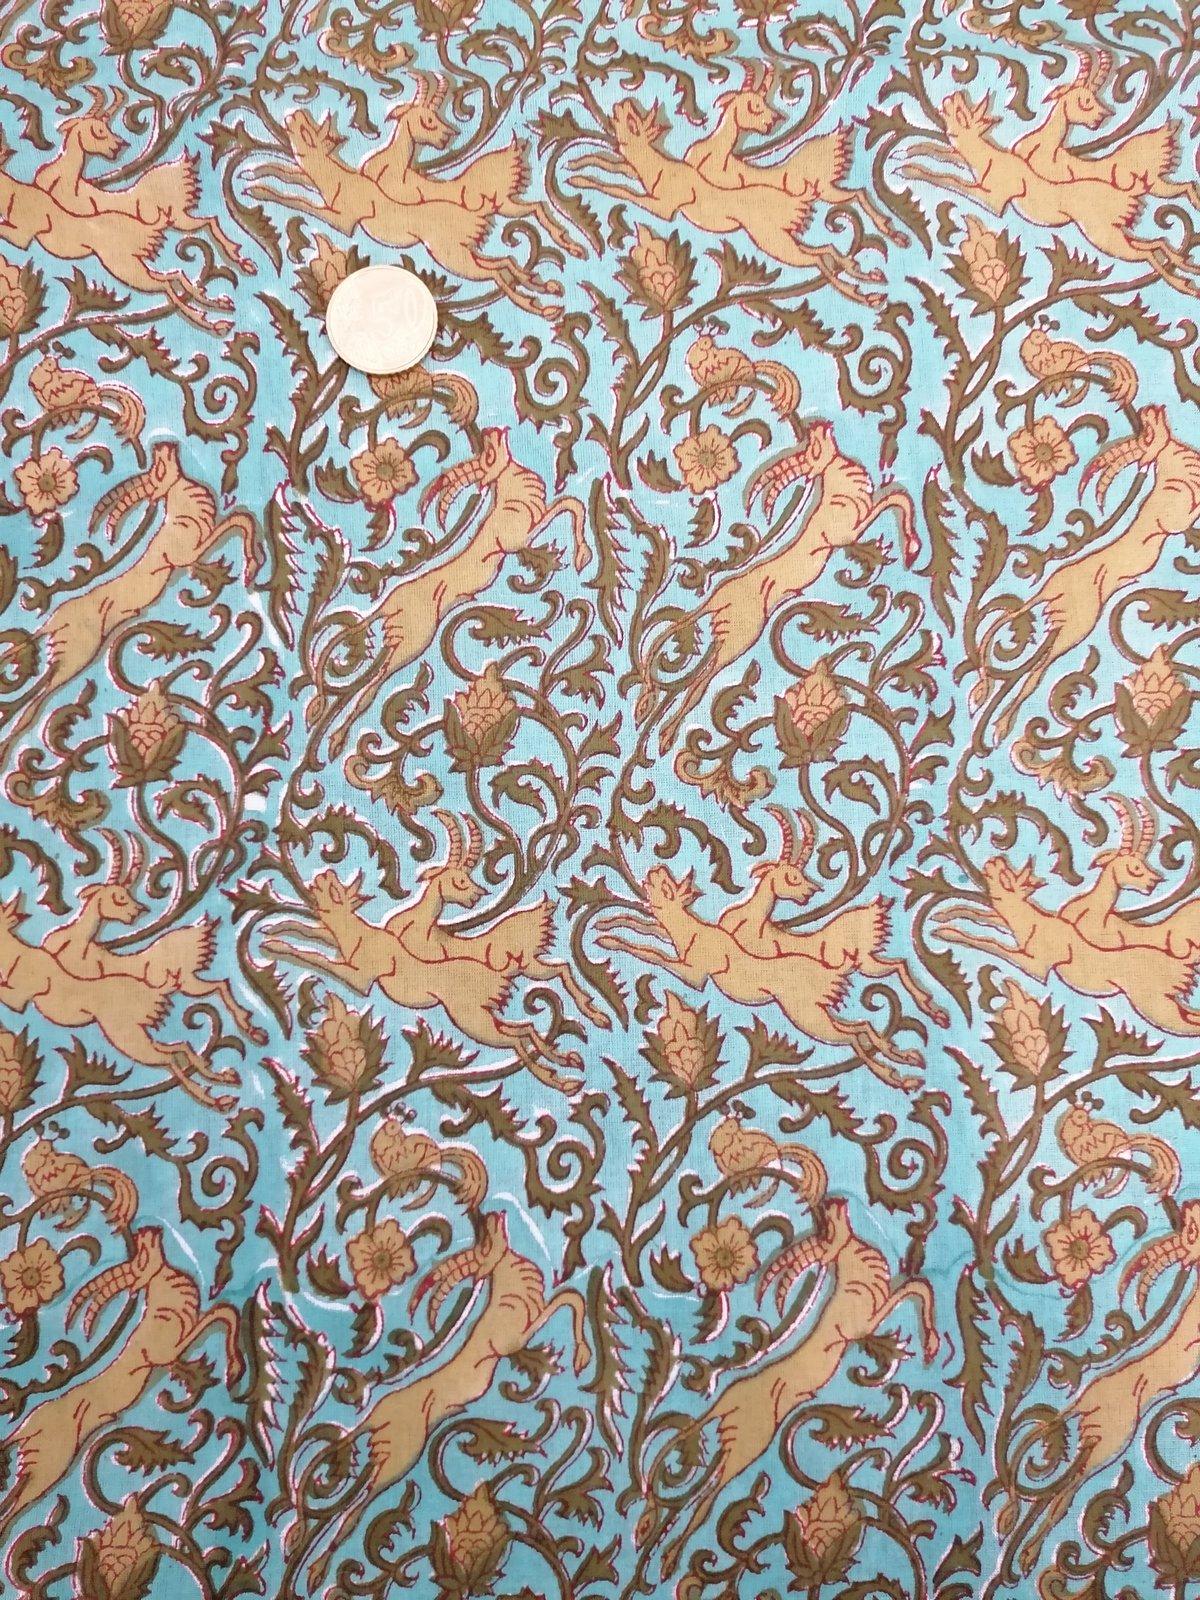 Image of Namasté fabric chamois